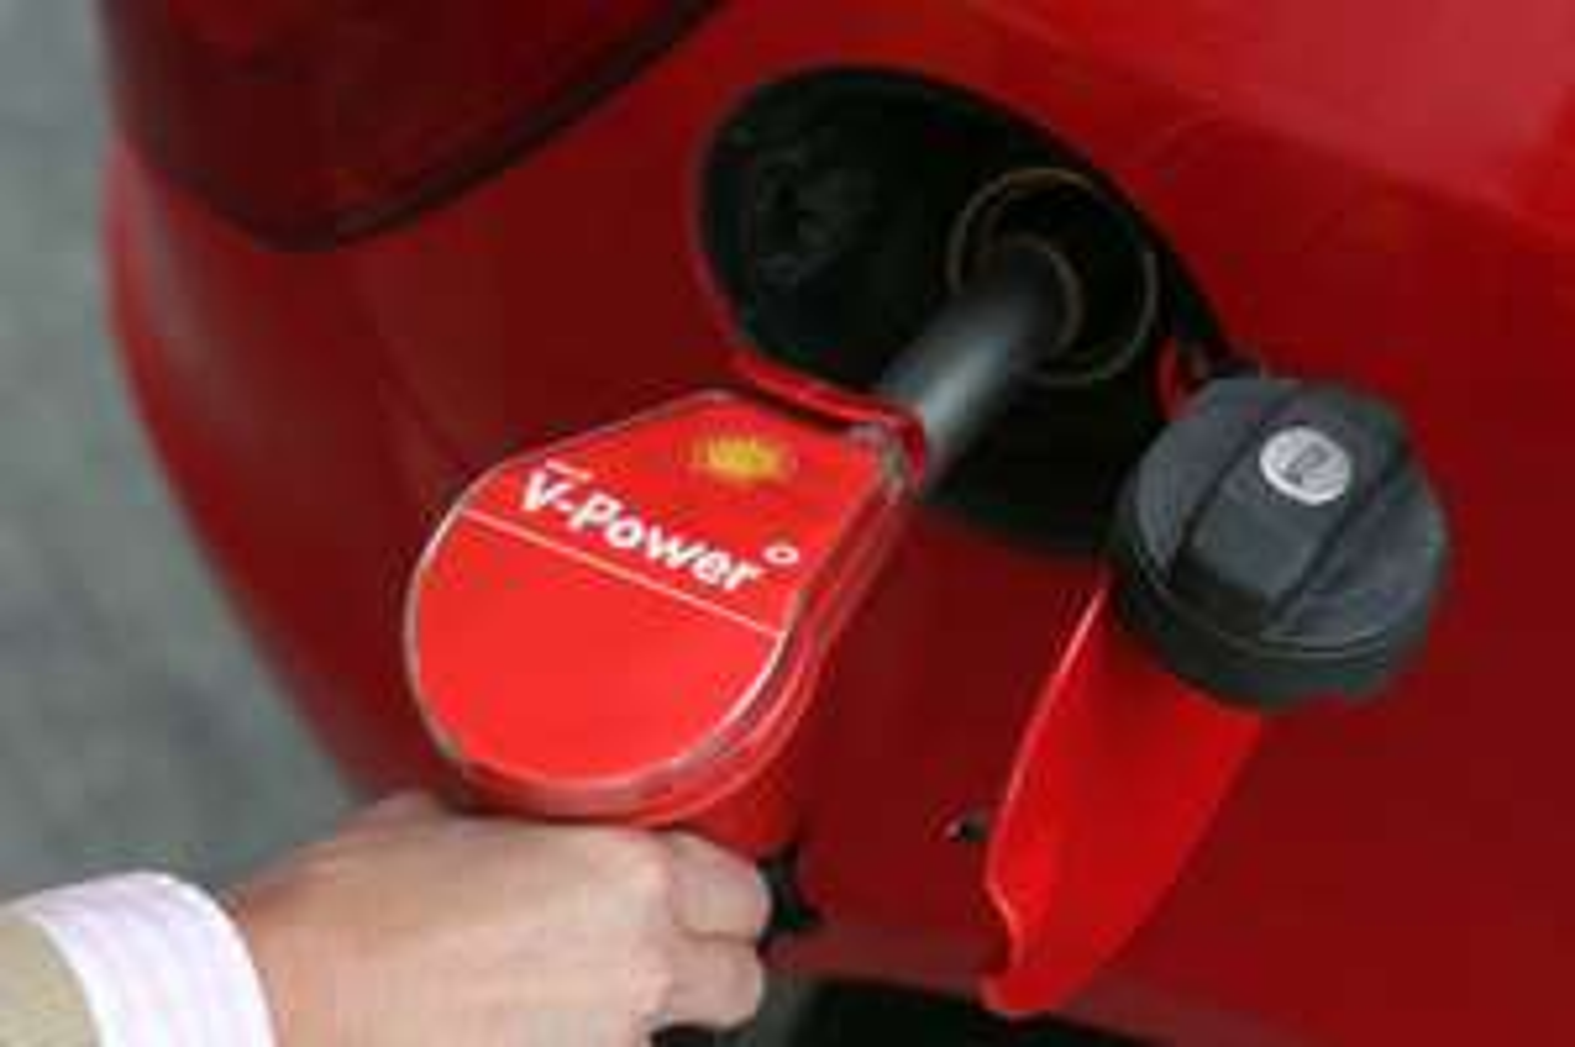 Einen Monat Shell V-Power Smartdeal kostenlos